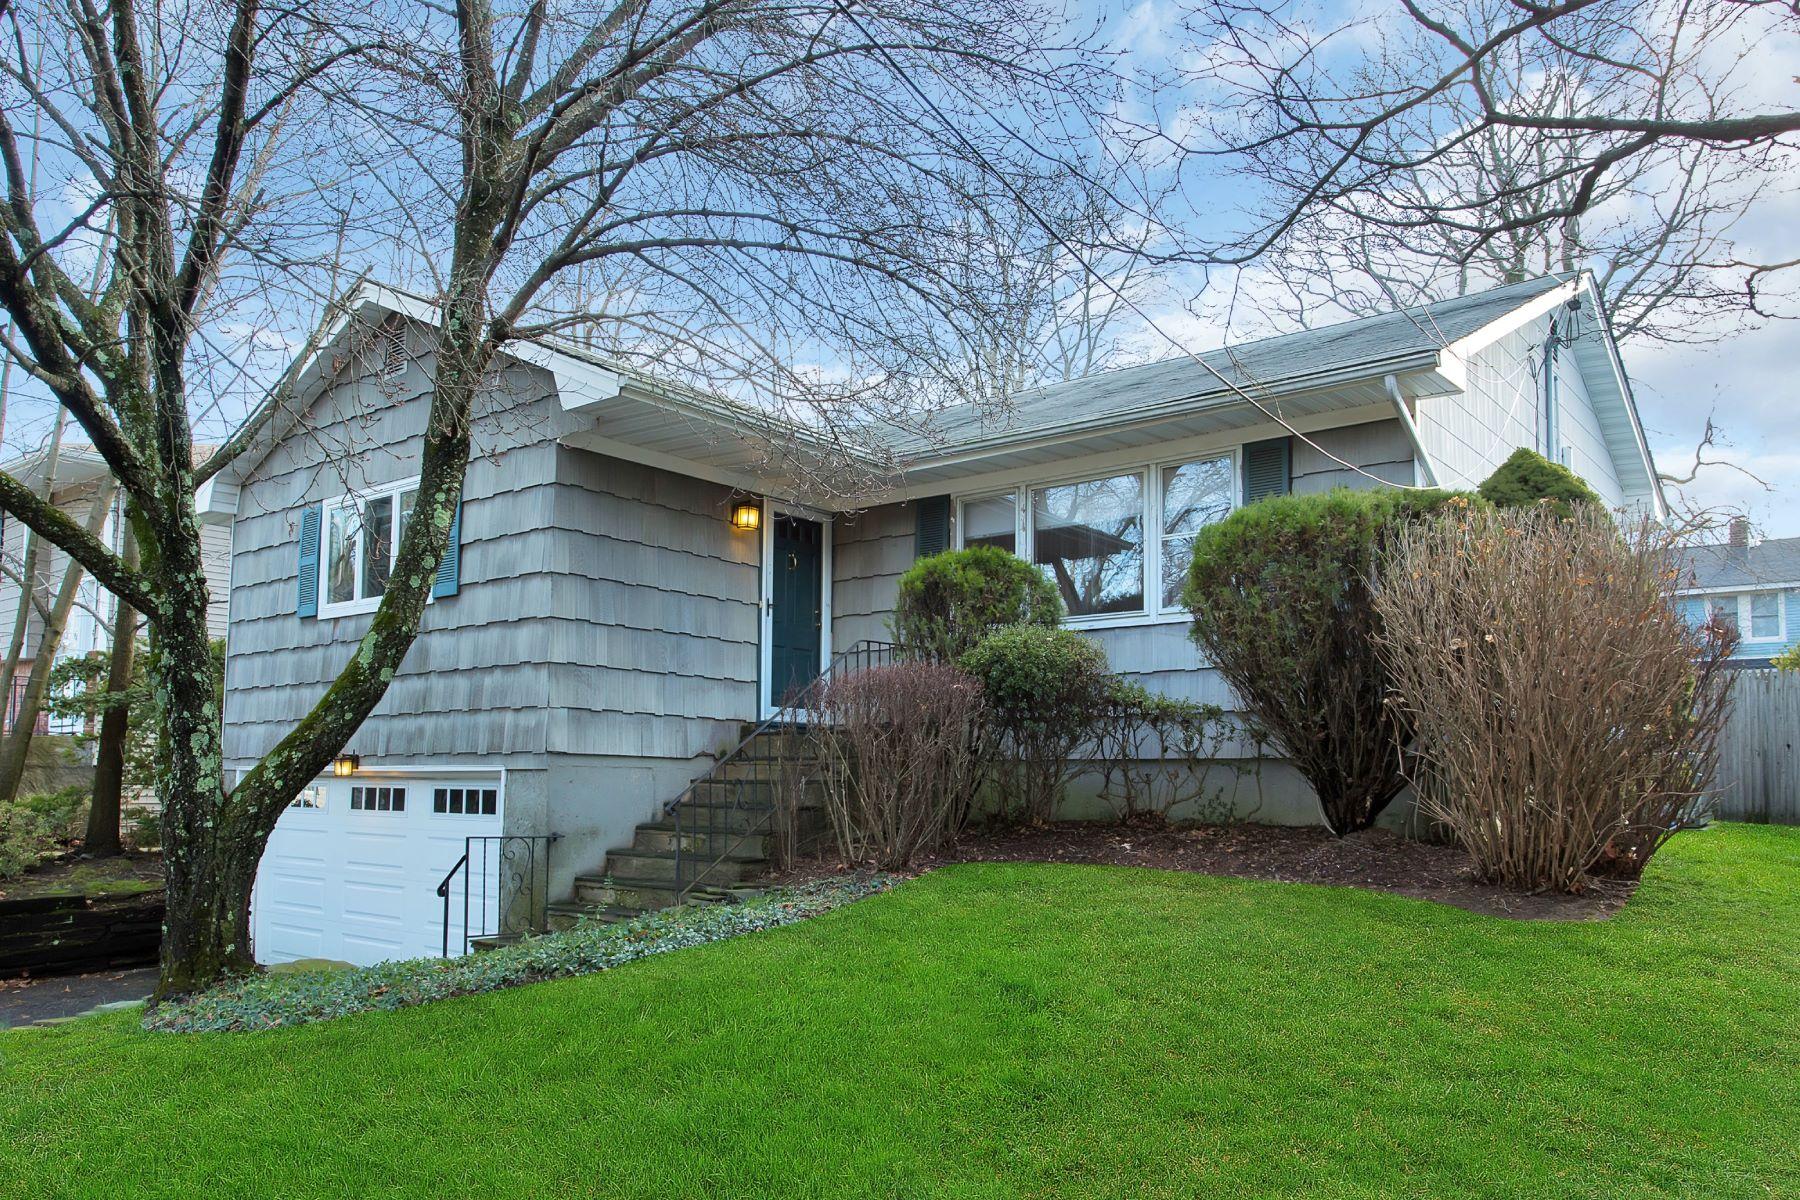 獨棟家庭住宅 為 出售 在 7 Wilafra Ln. Northport, 紐約州, 11768 美國